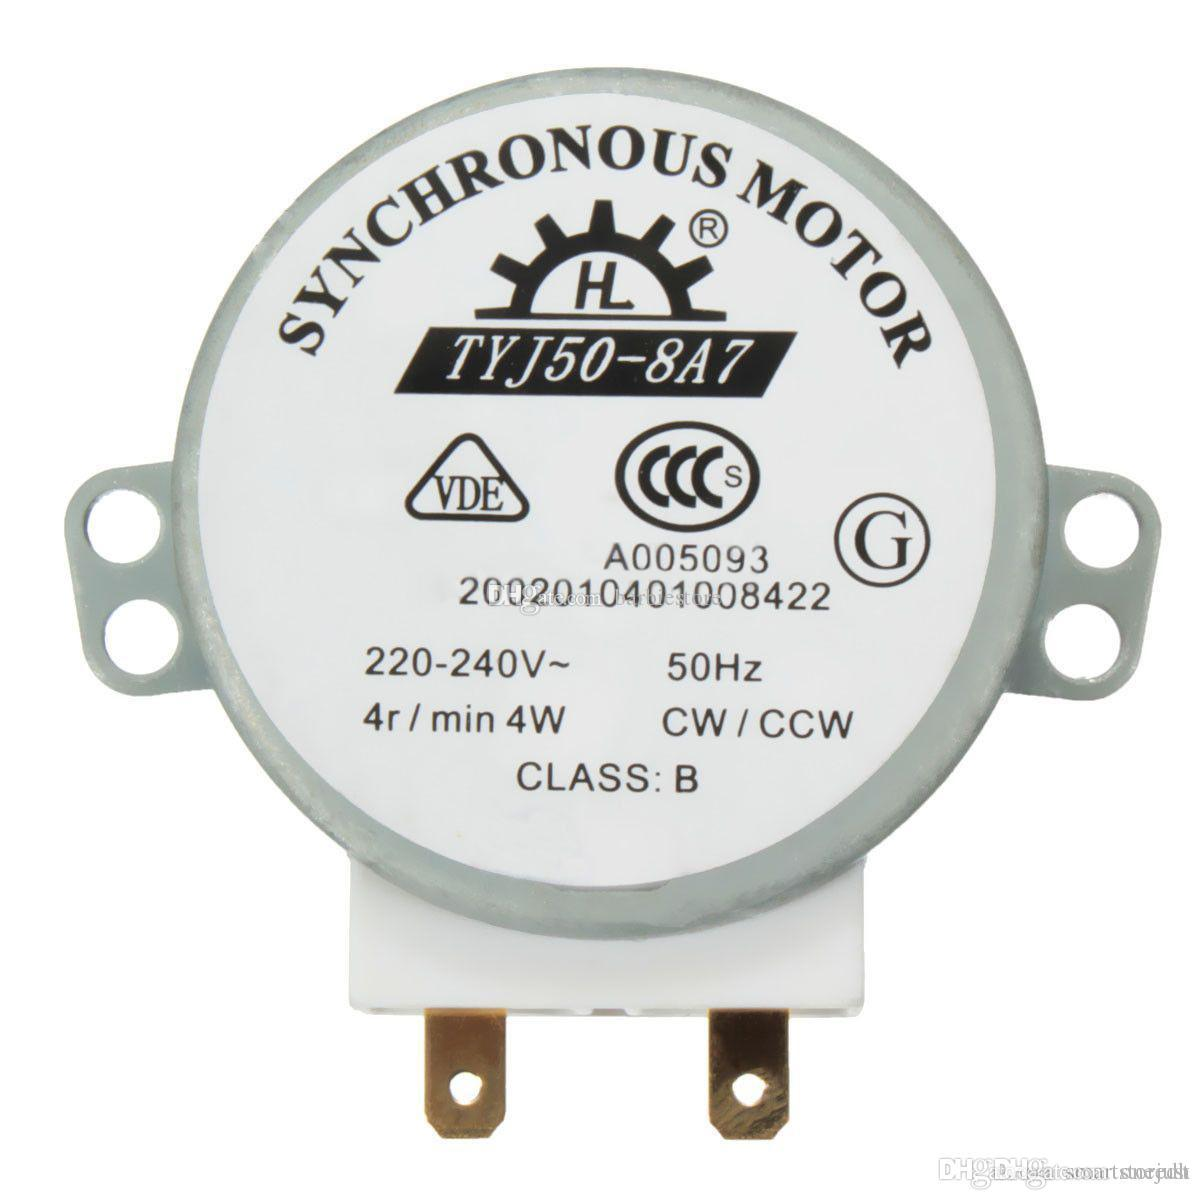 Giradischi Microonde Giradischi Motore sincrono TYJ50-8A7 D Albero 4 Giri B00237 JUST